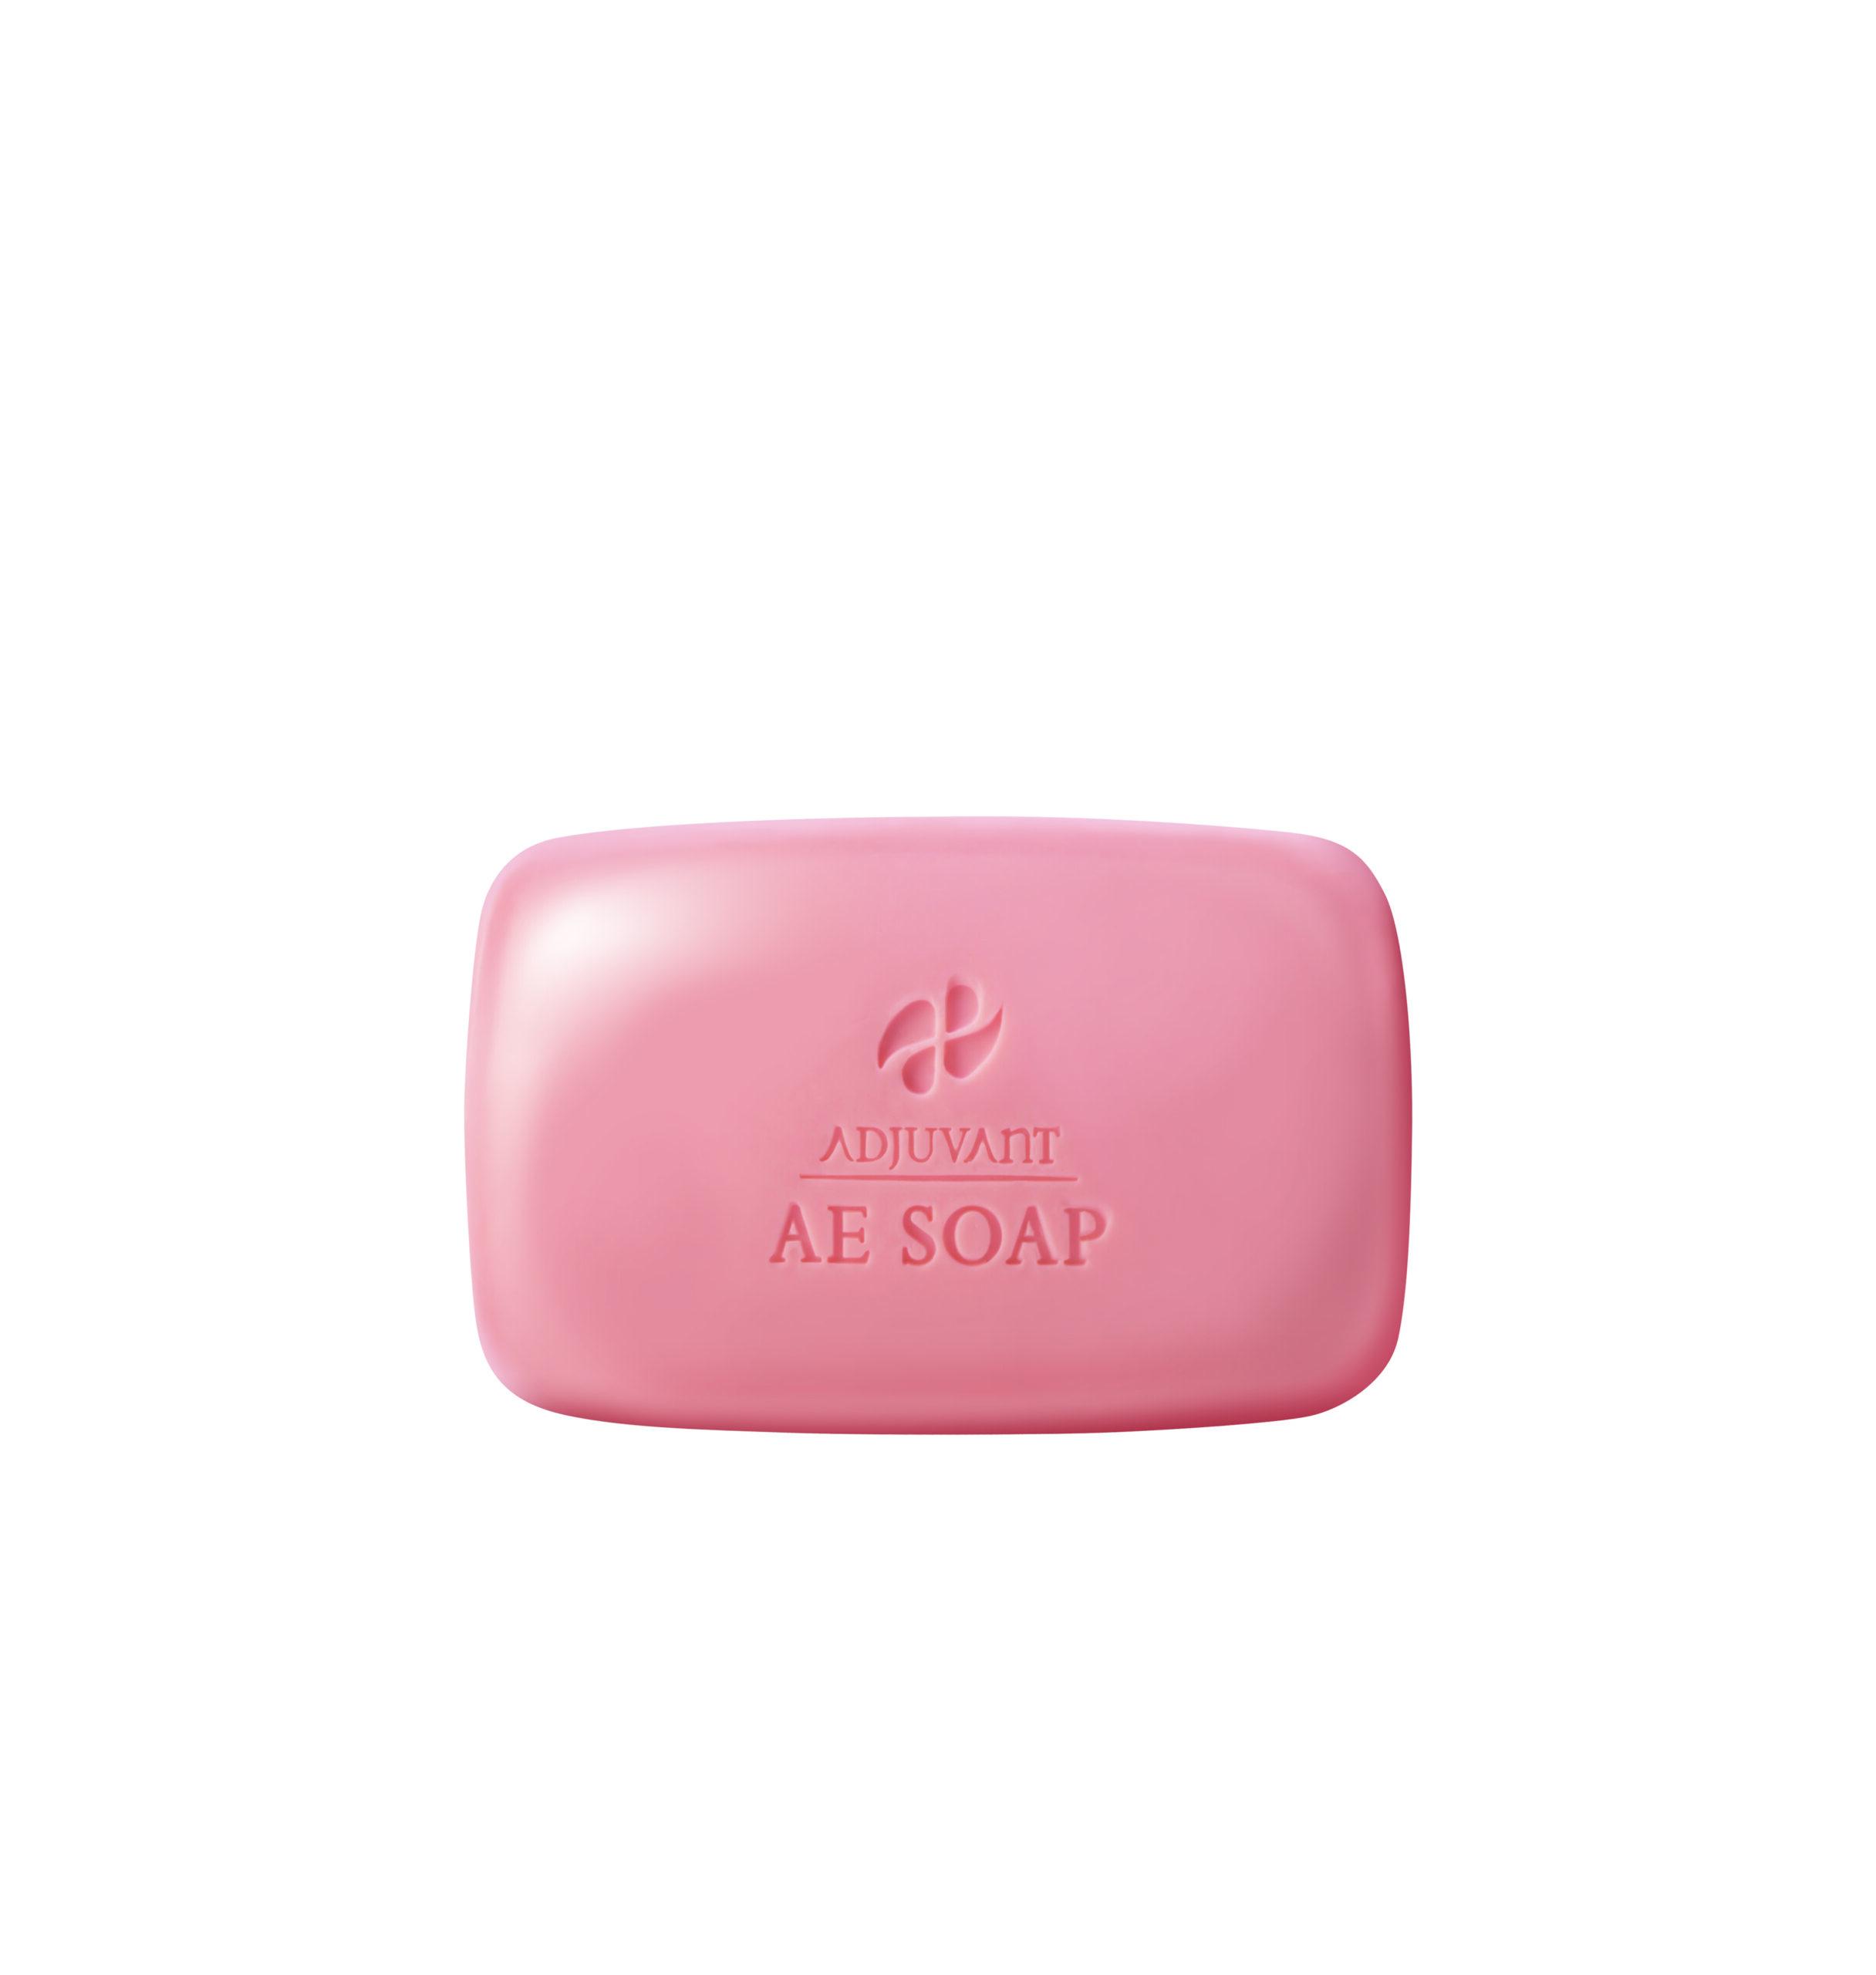 NEW AE Soap Moist_b2